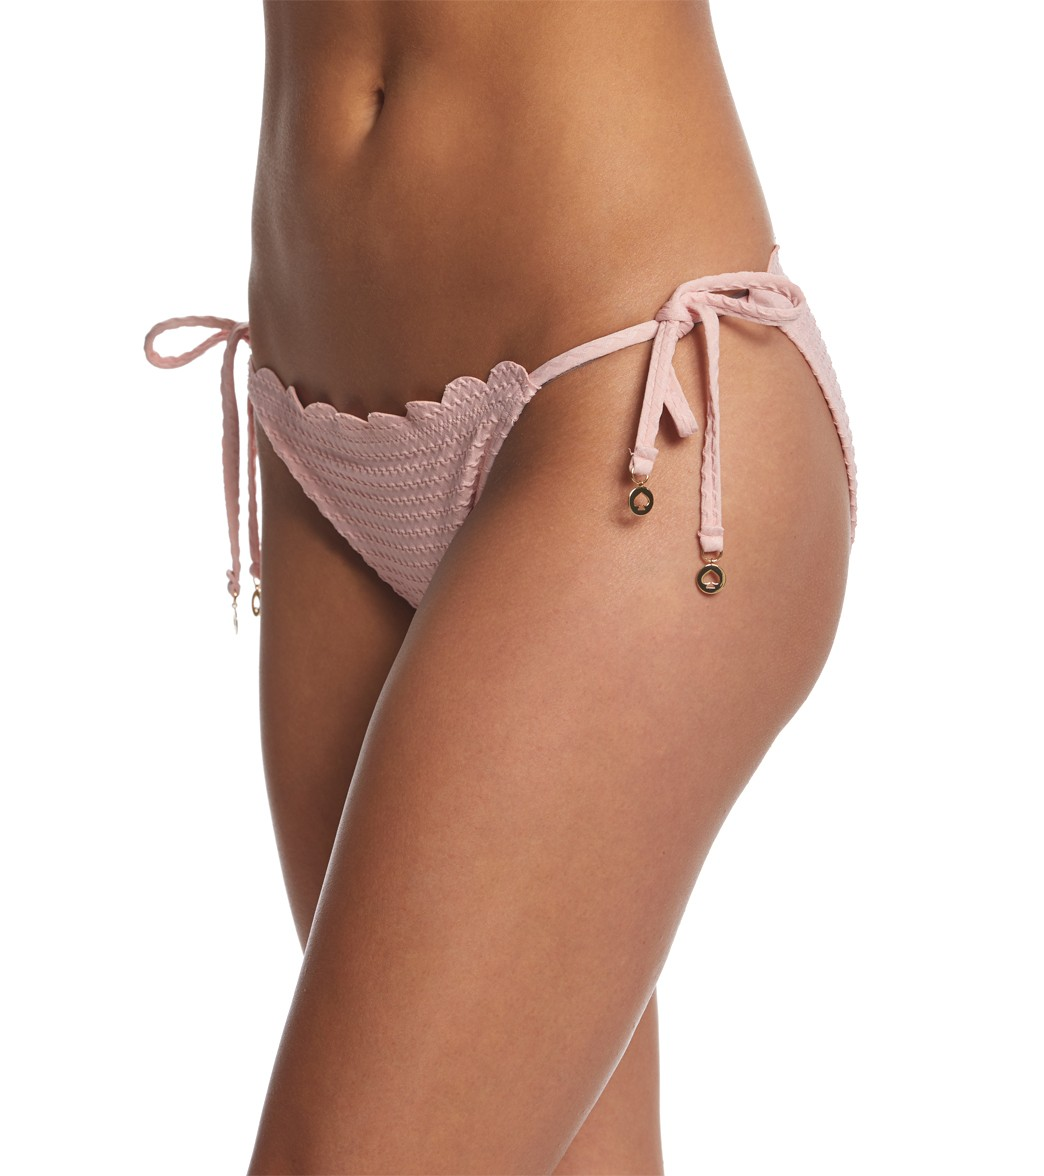 b4f4b31ac6 Kate Spade New York Marina Piccola Textured Scallop String Bikini Bottom